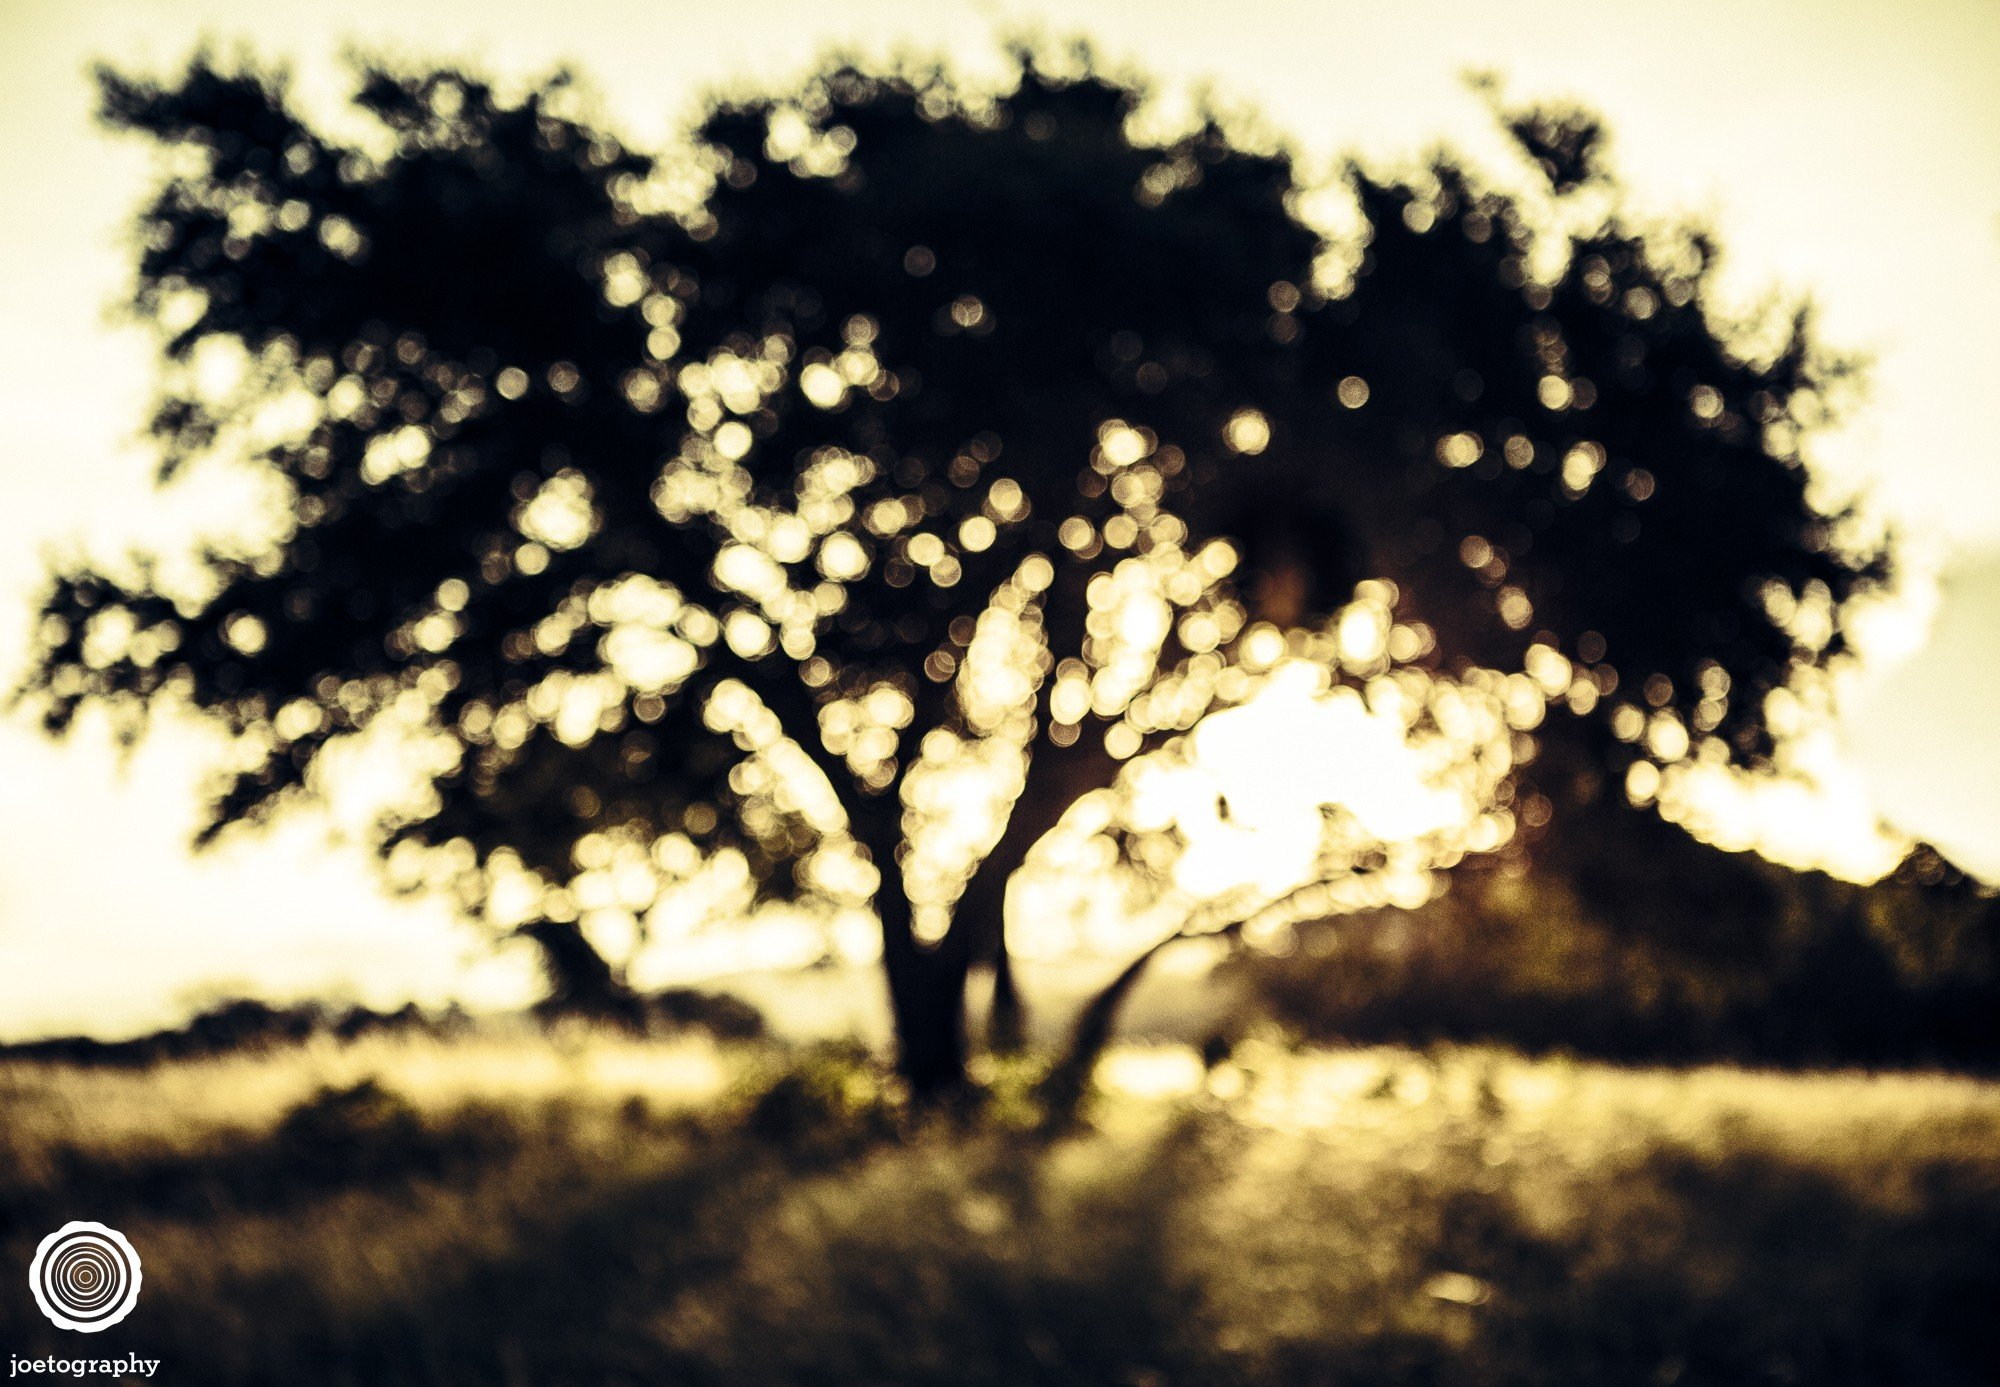 laity-lodge-san-antonio-texas-landscape-photographer-indianapolis-25